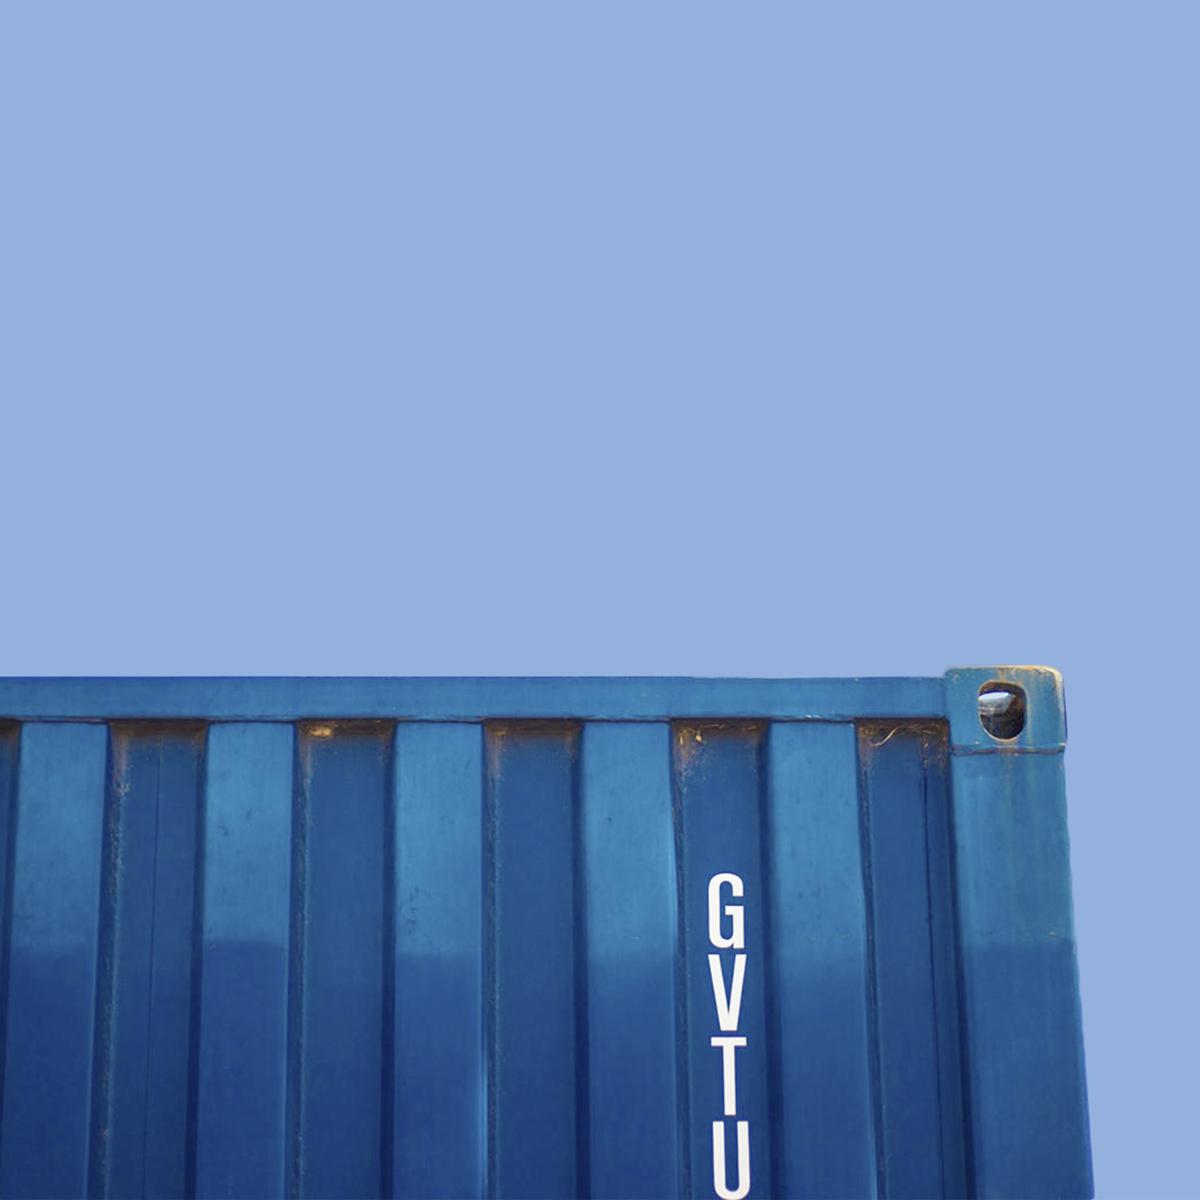 DISTRI_CONSO_container_RVB_CARRE_JPEG